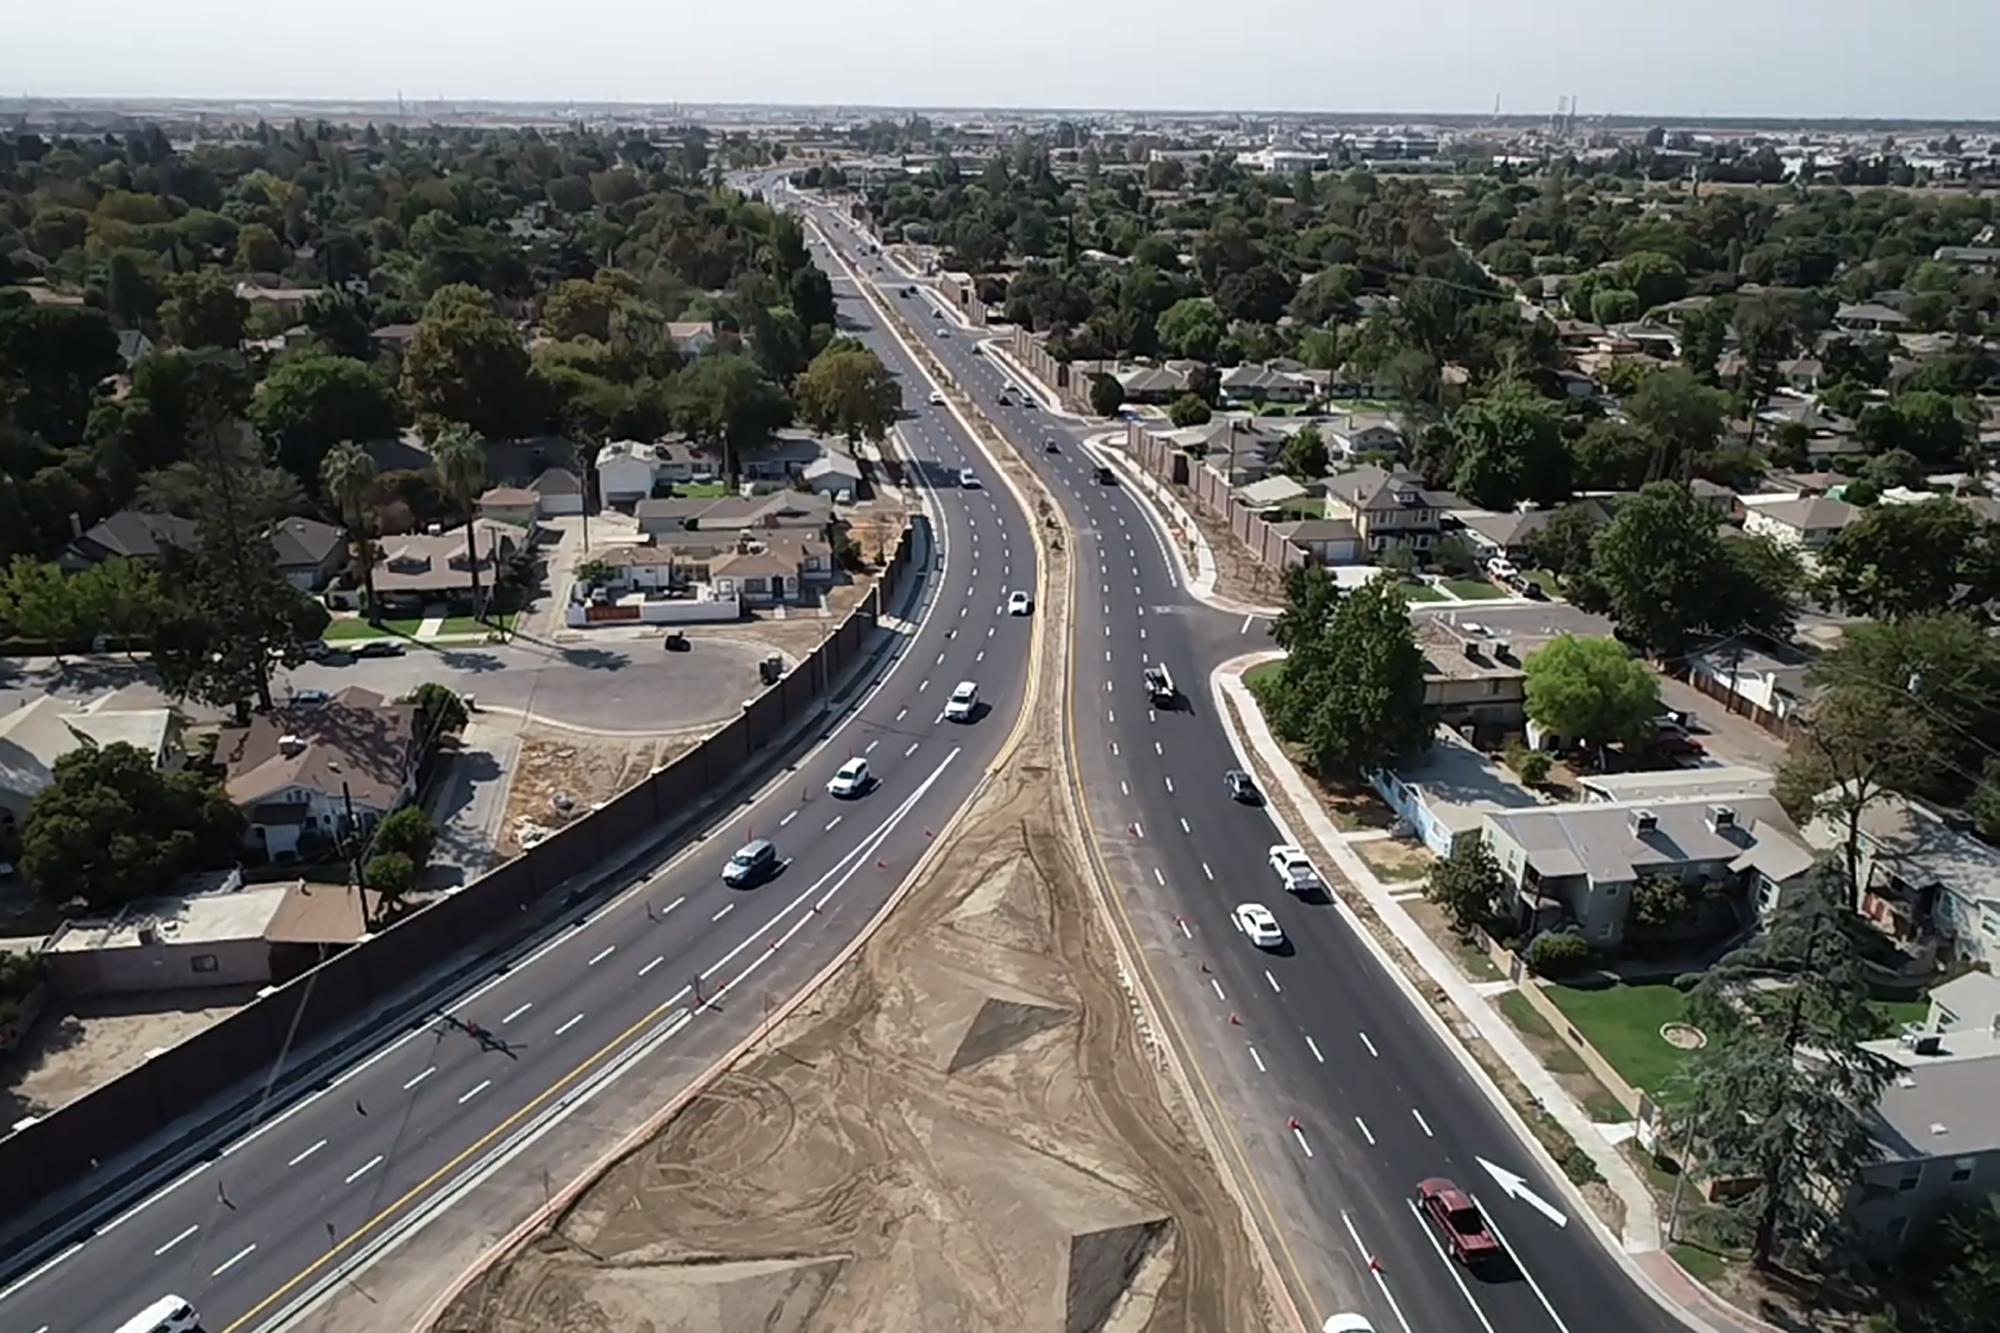 24th Street Improvement Project